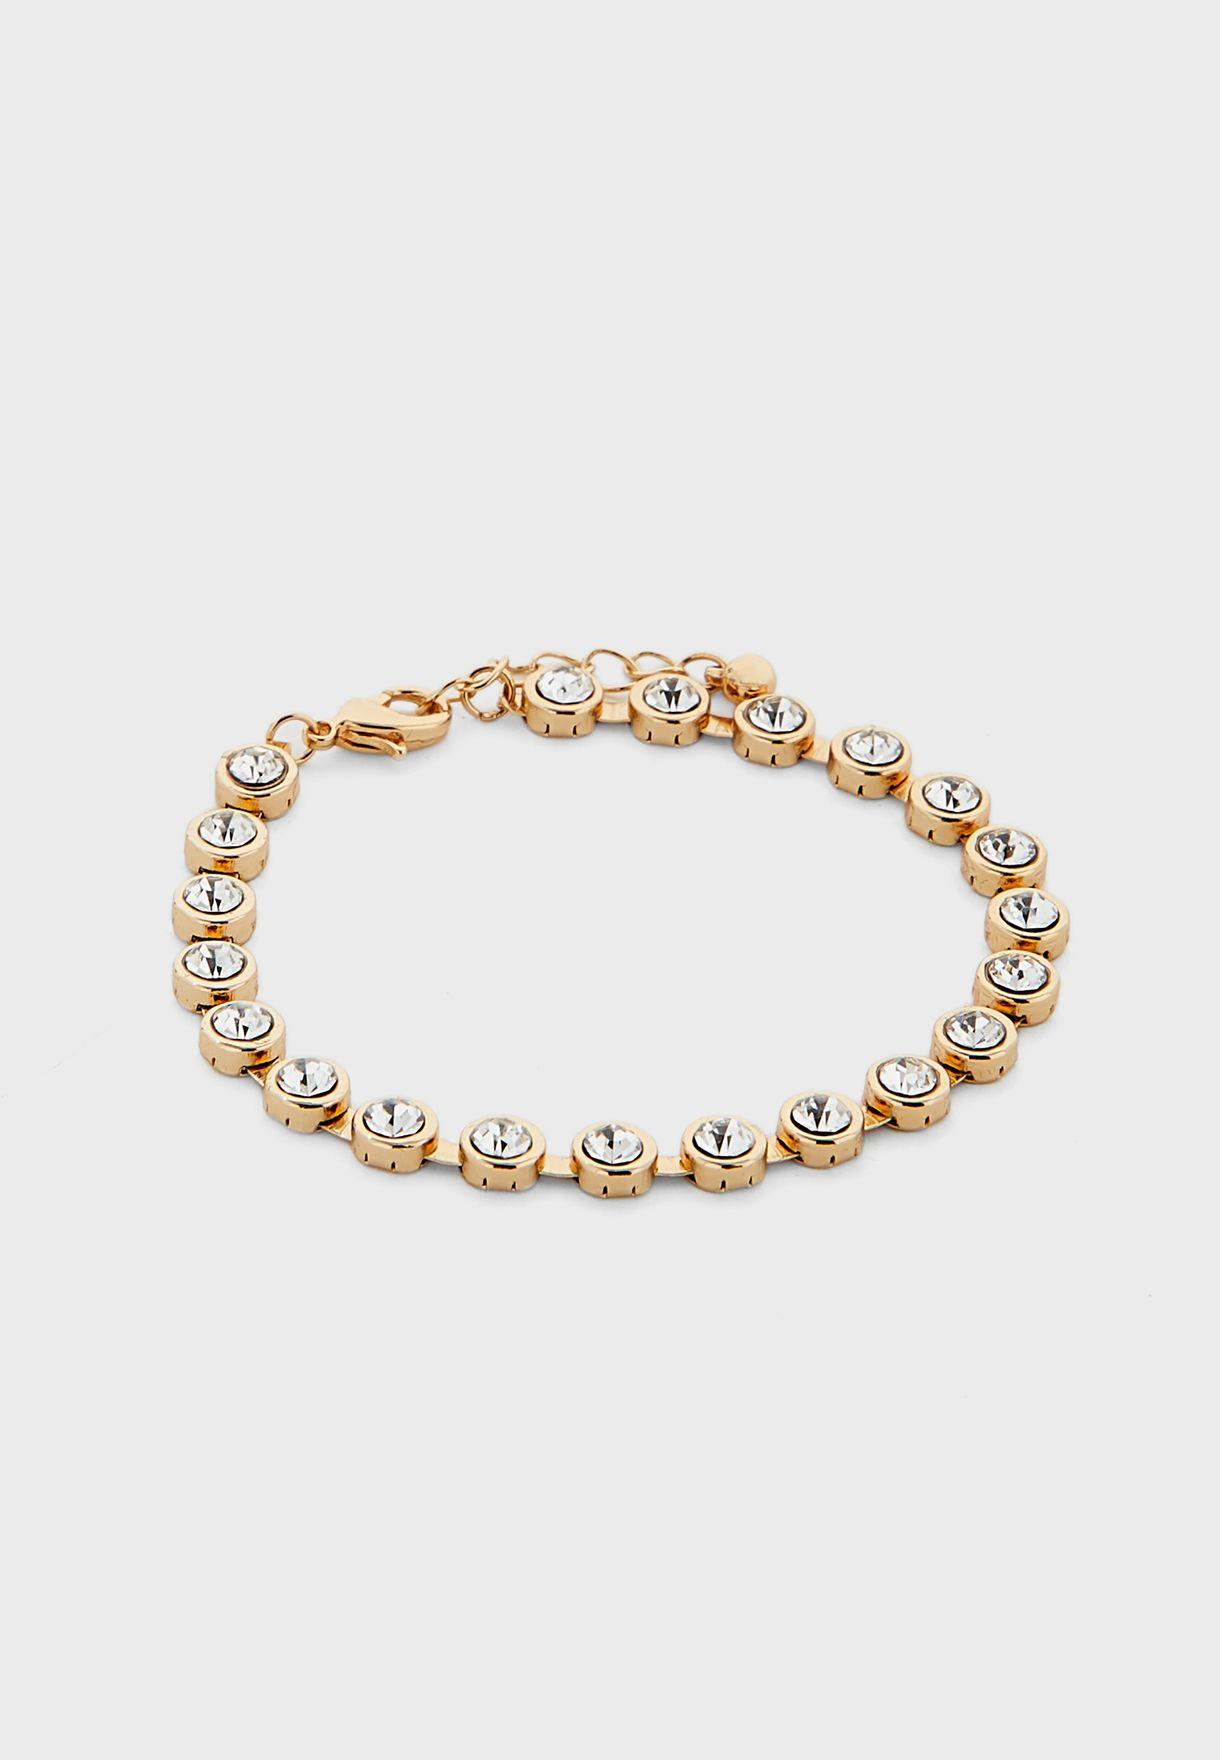 Circle Stone Necklace Earring, Bracelet Ring Set